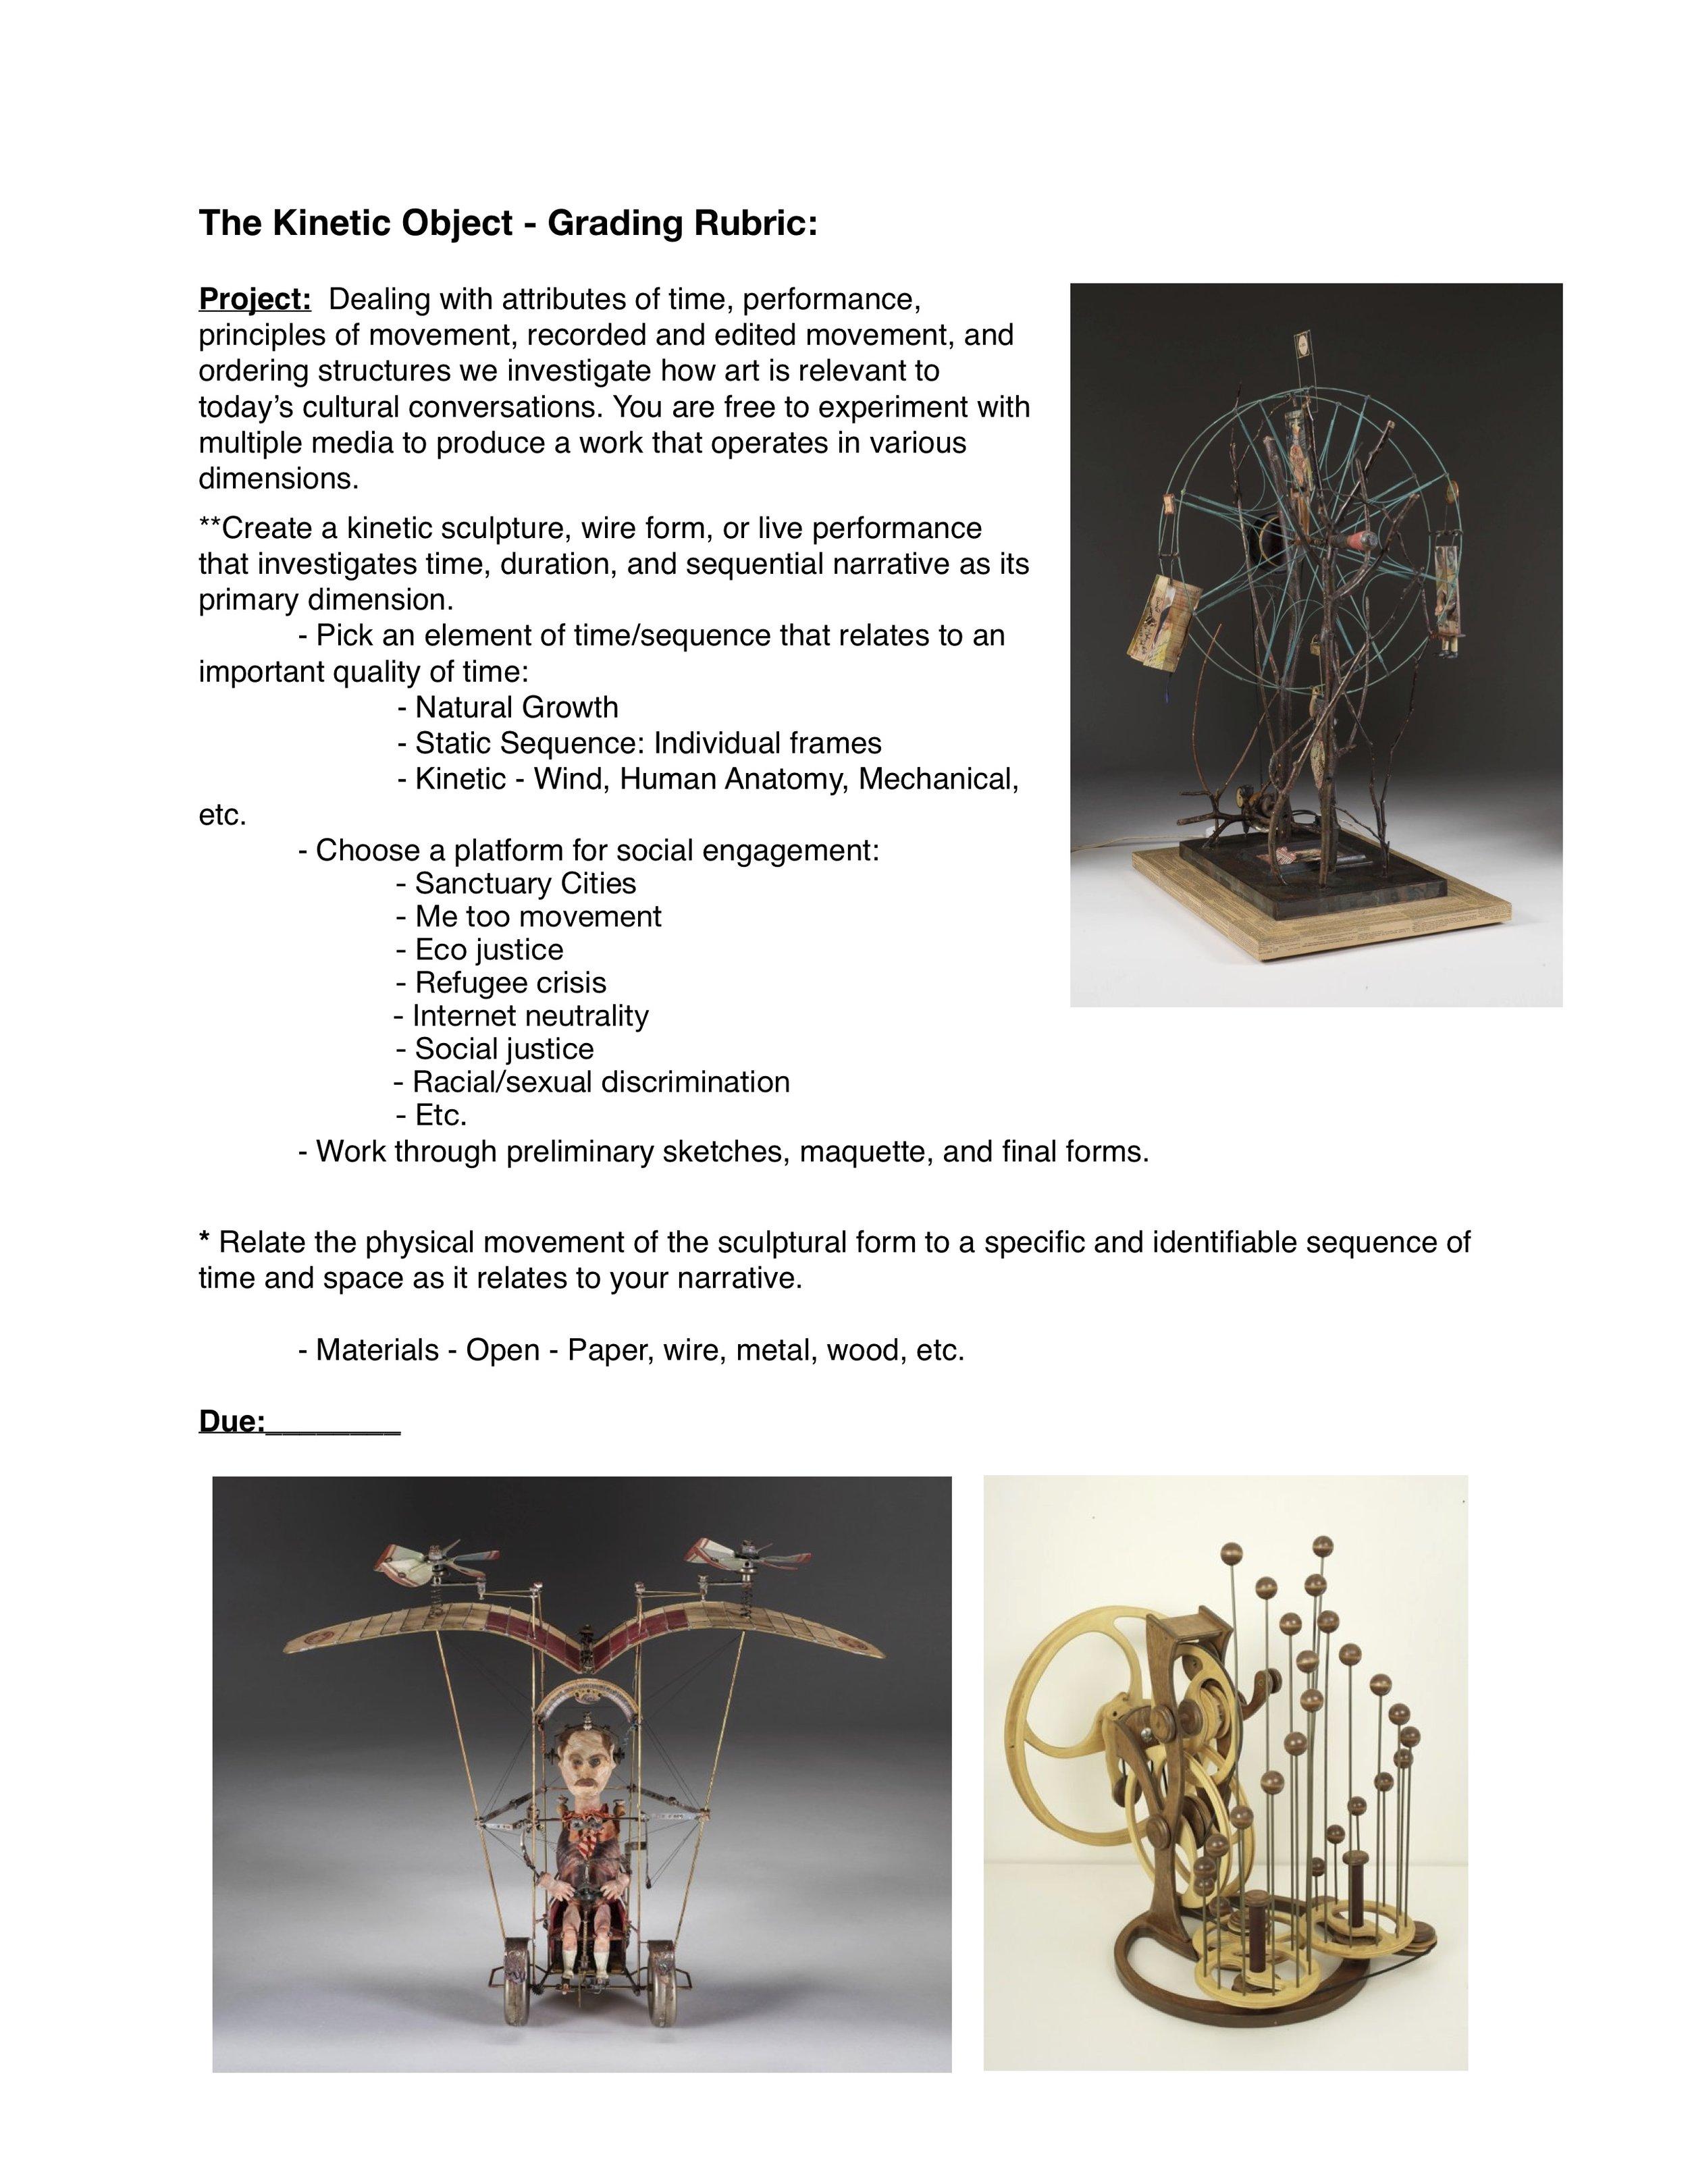 8 - The Kinetic Object.jpg